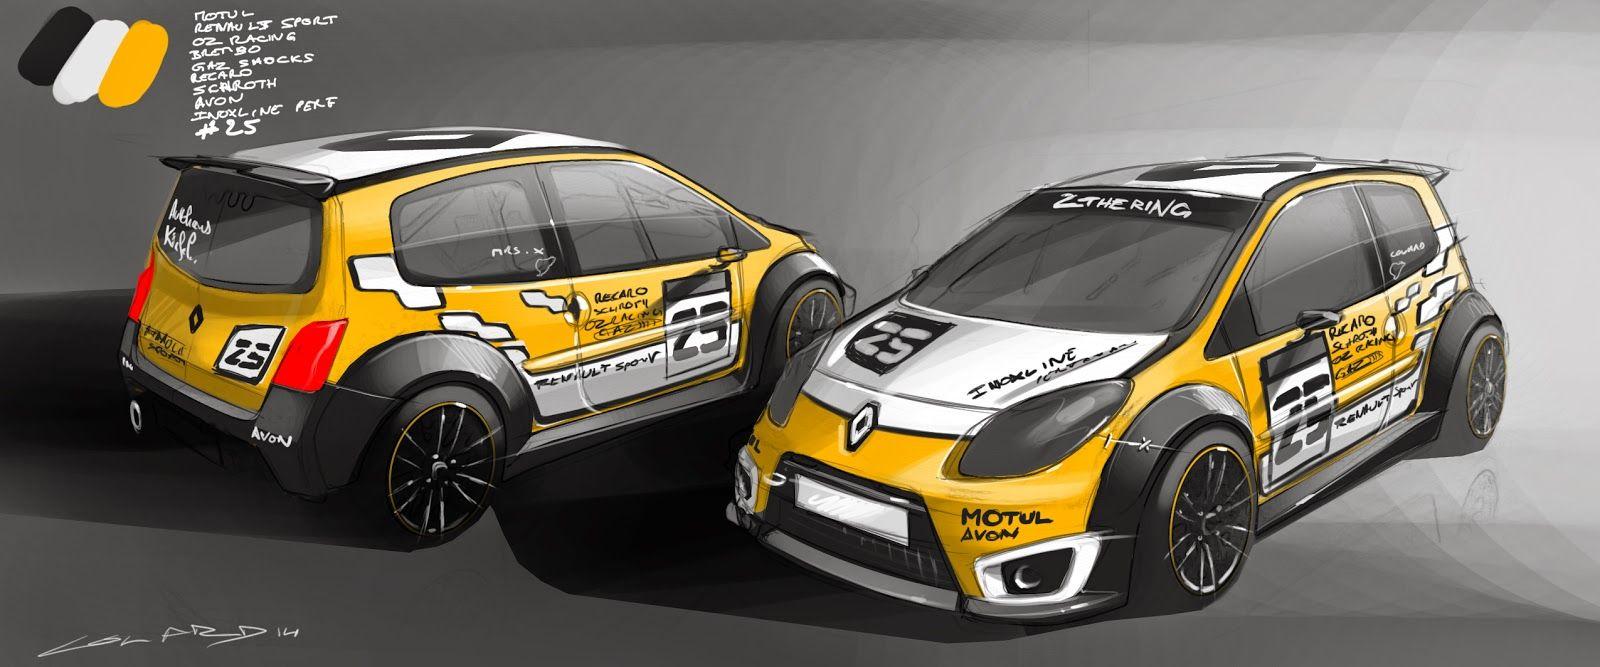 Landspeed Blog Twingo Rs Renault Twingo Voitures Et Motos